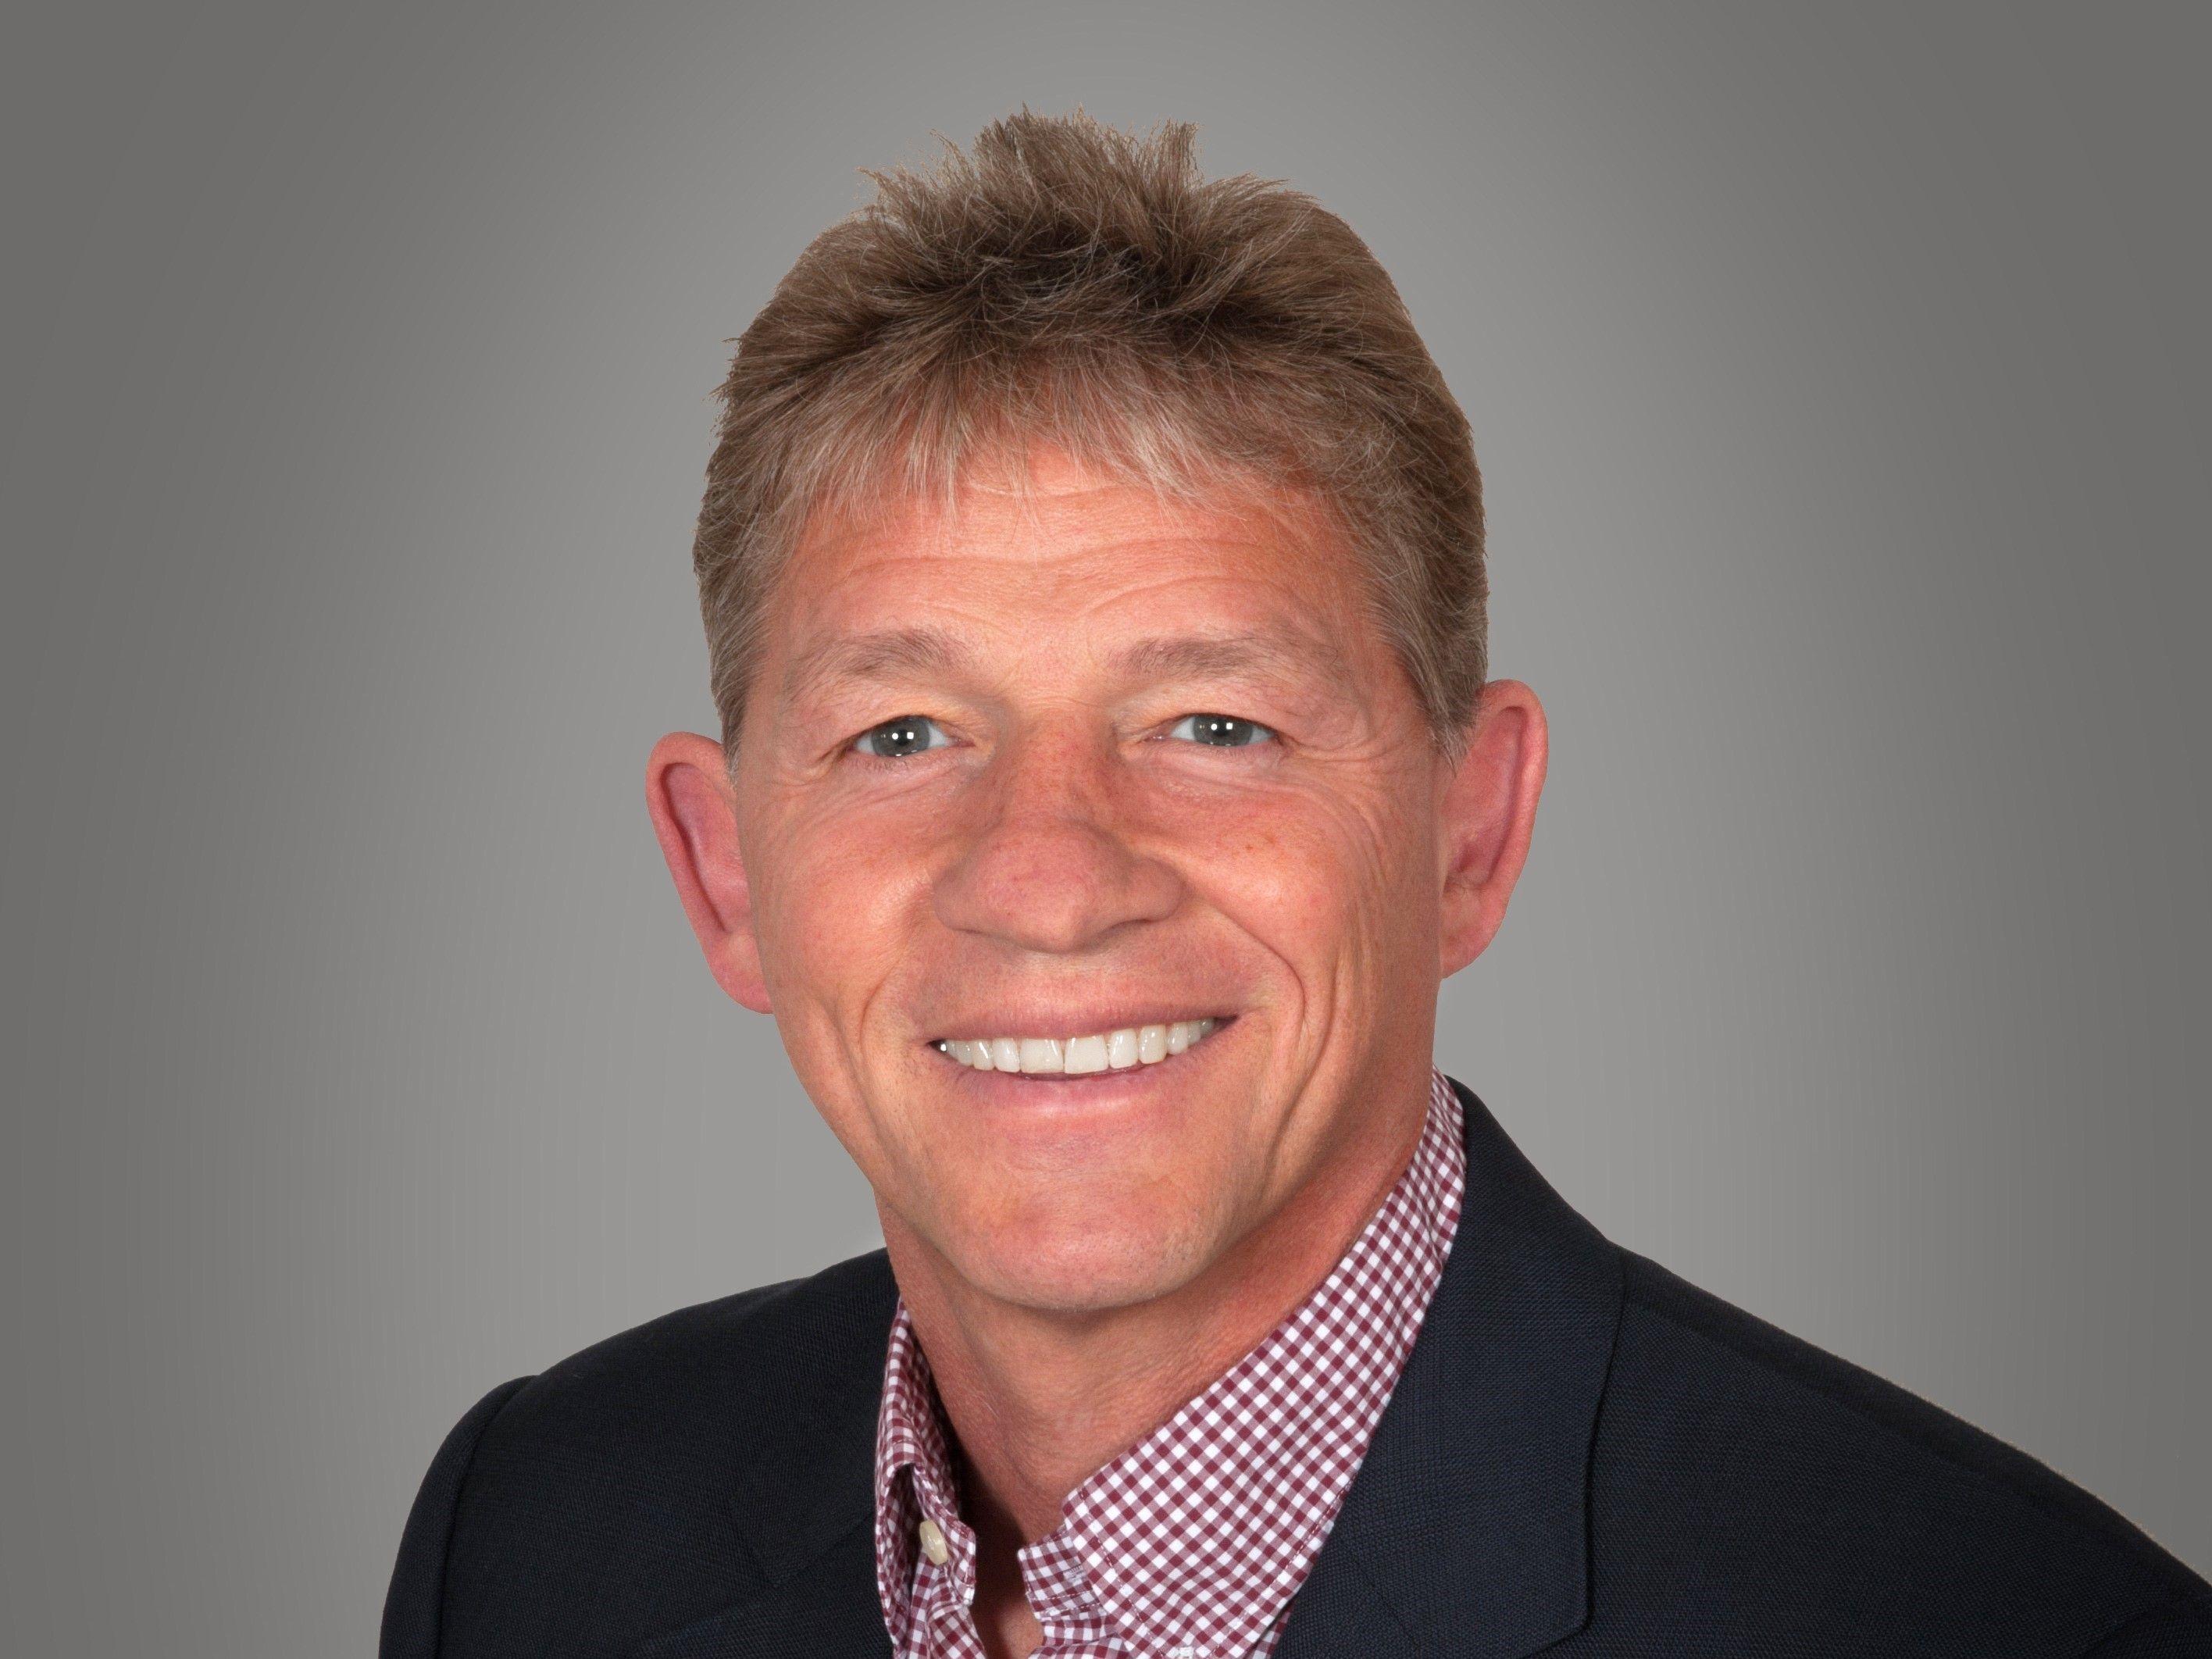 Andrew Hotchkiss joins Draupnir Bio as CEO